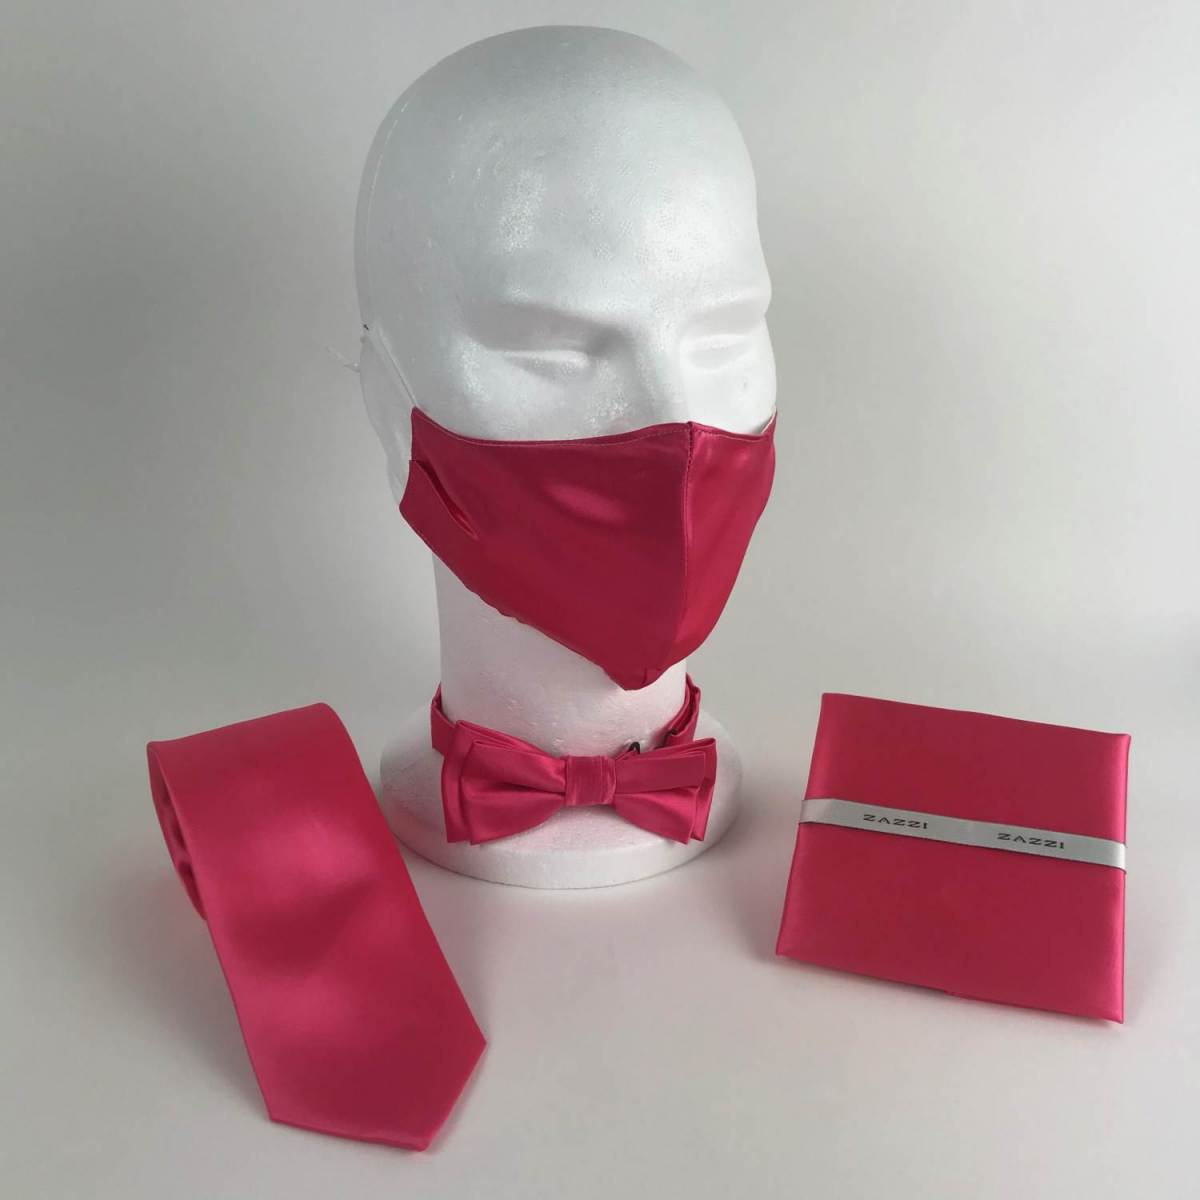 B1764 35 Lipstick FM. mens ties facemasks con murphys menswear cork scaled - - Con Murphys Menswear